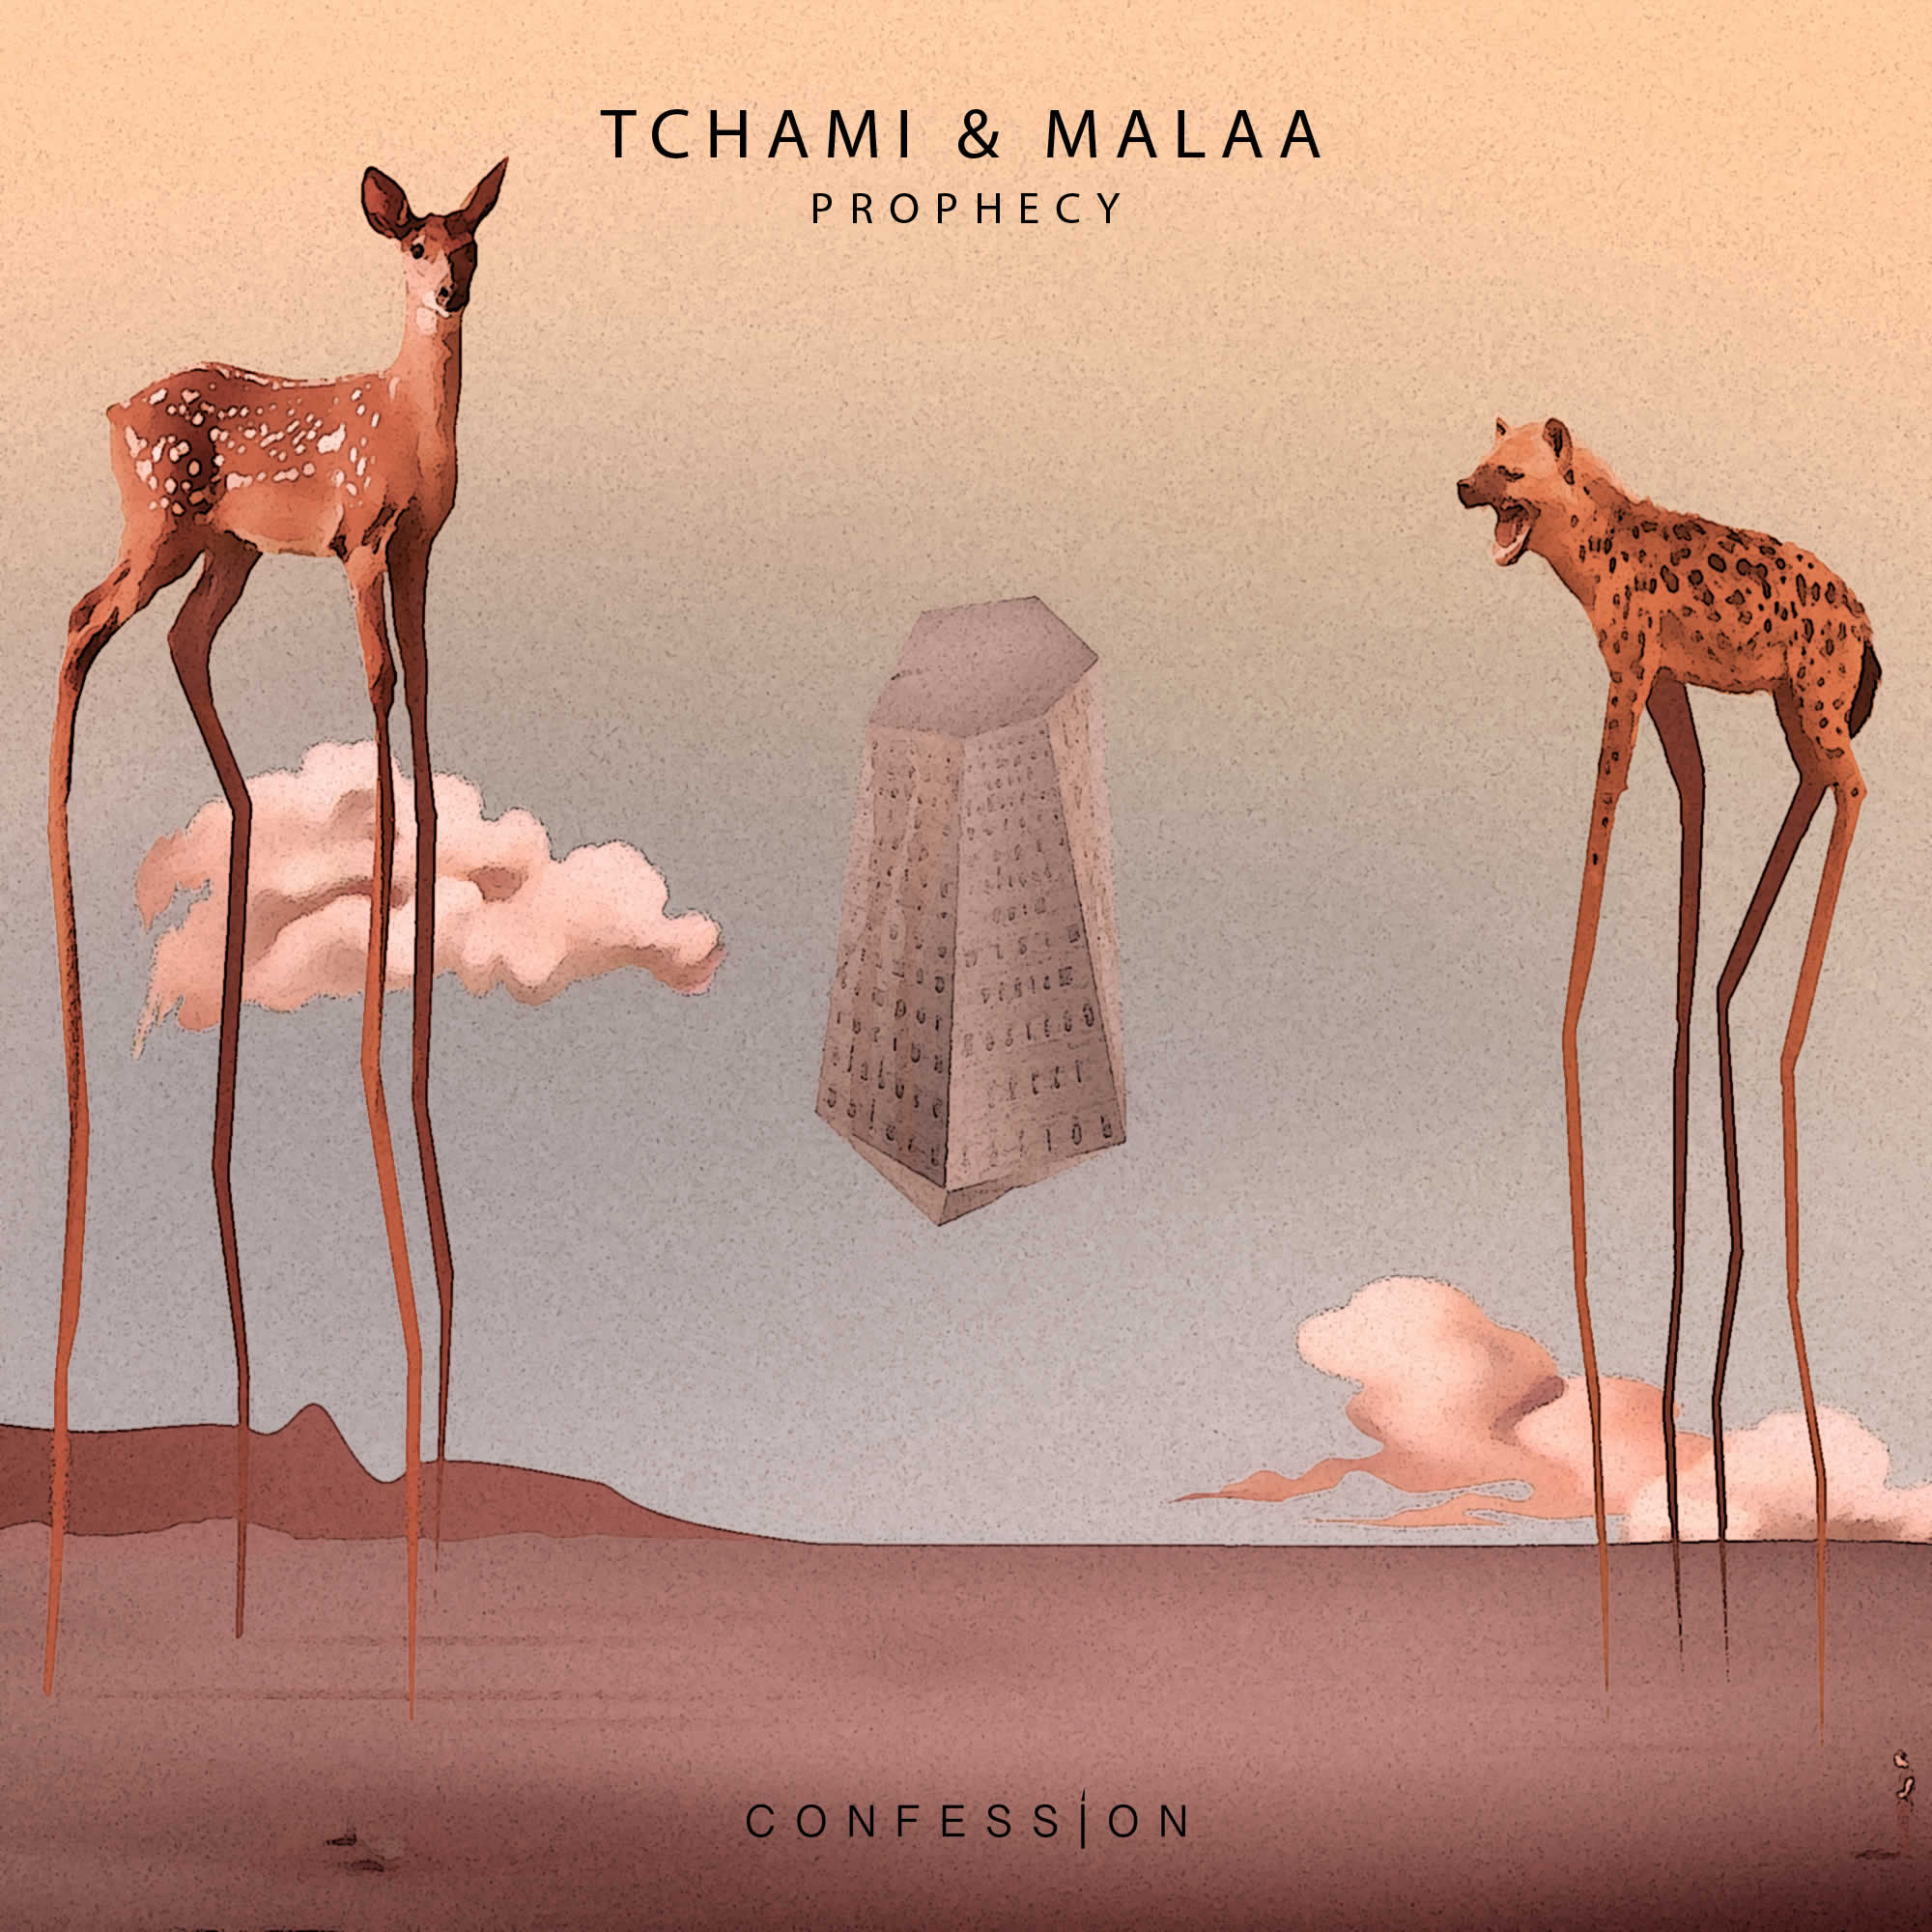 confession_tchami-malaa-prophecy.jpg